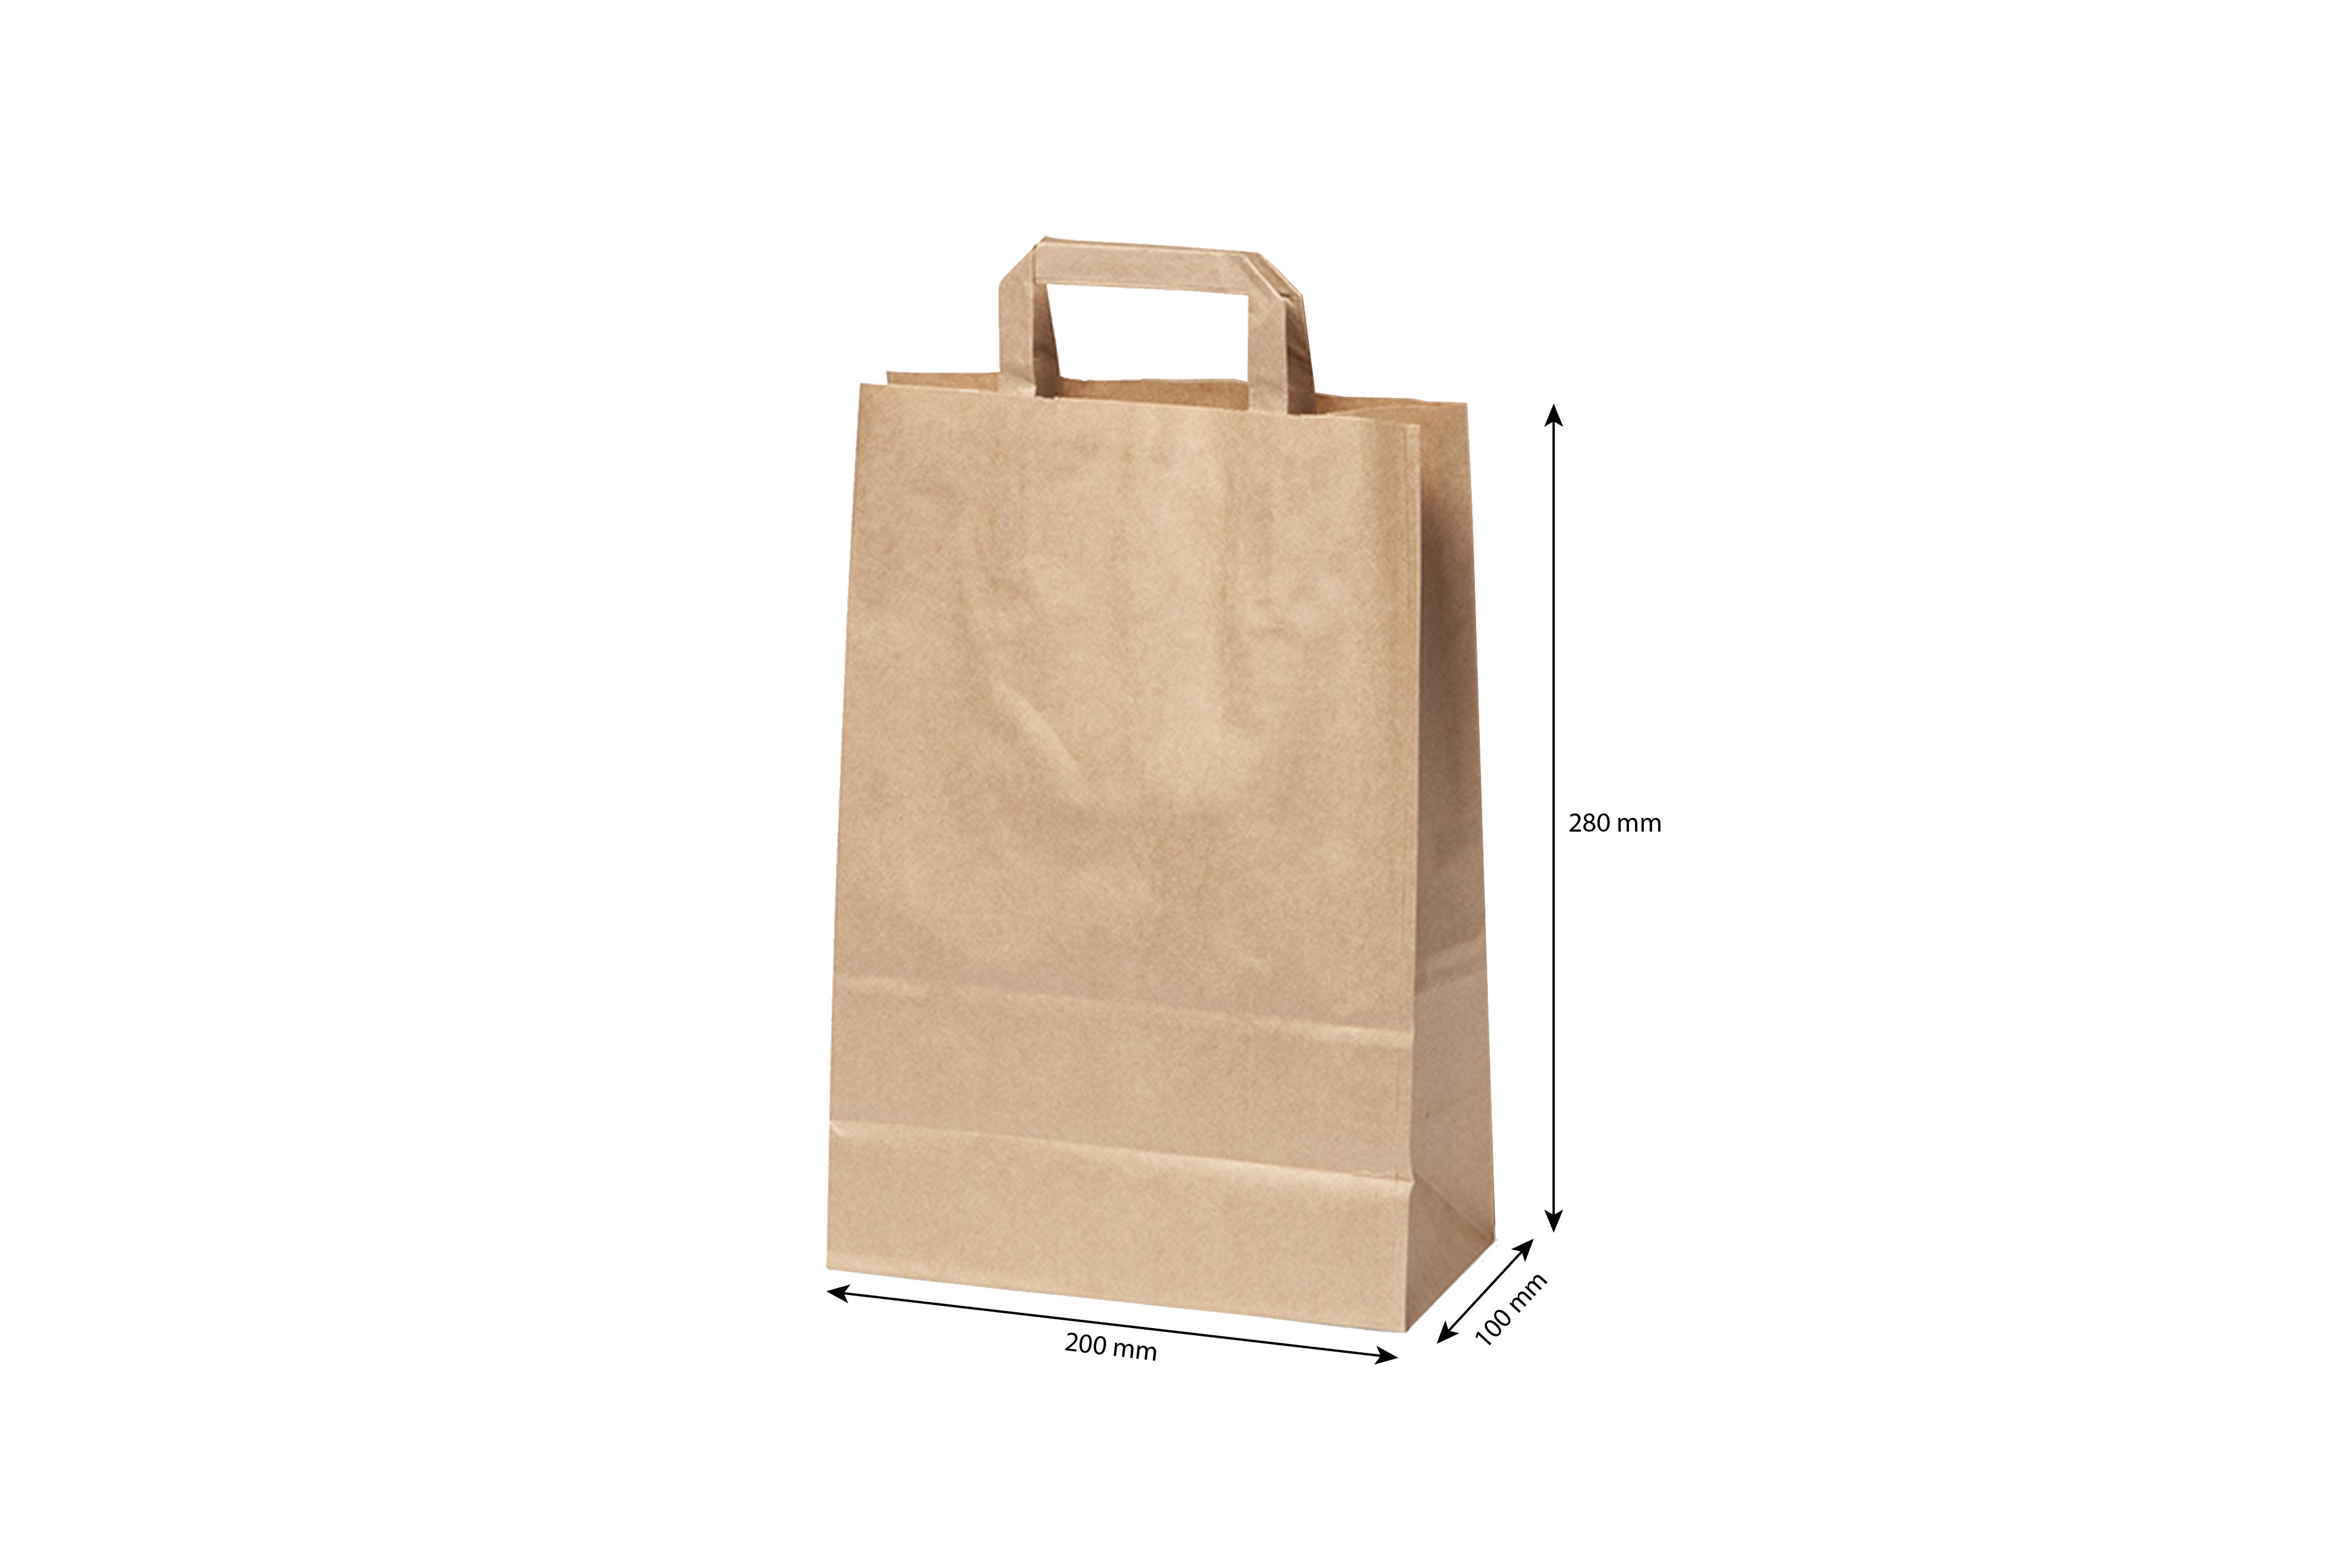 Bruine Papieren draagtassen  200 x  280 mm